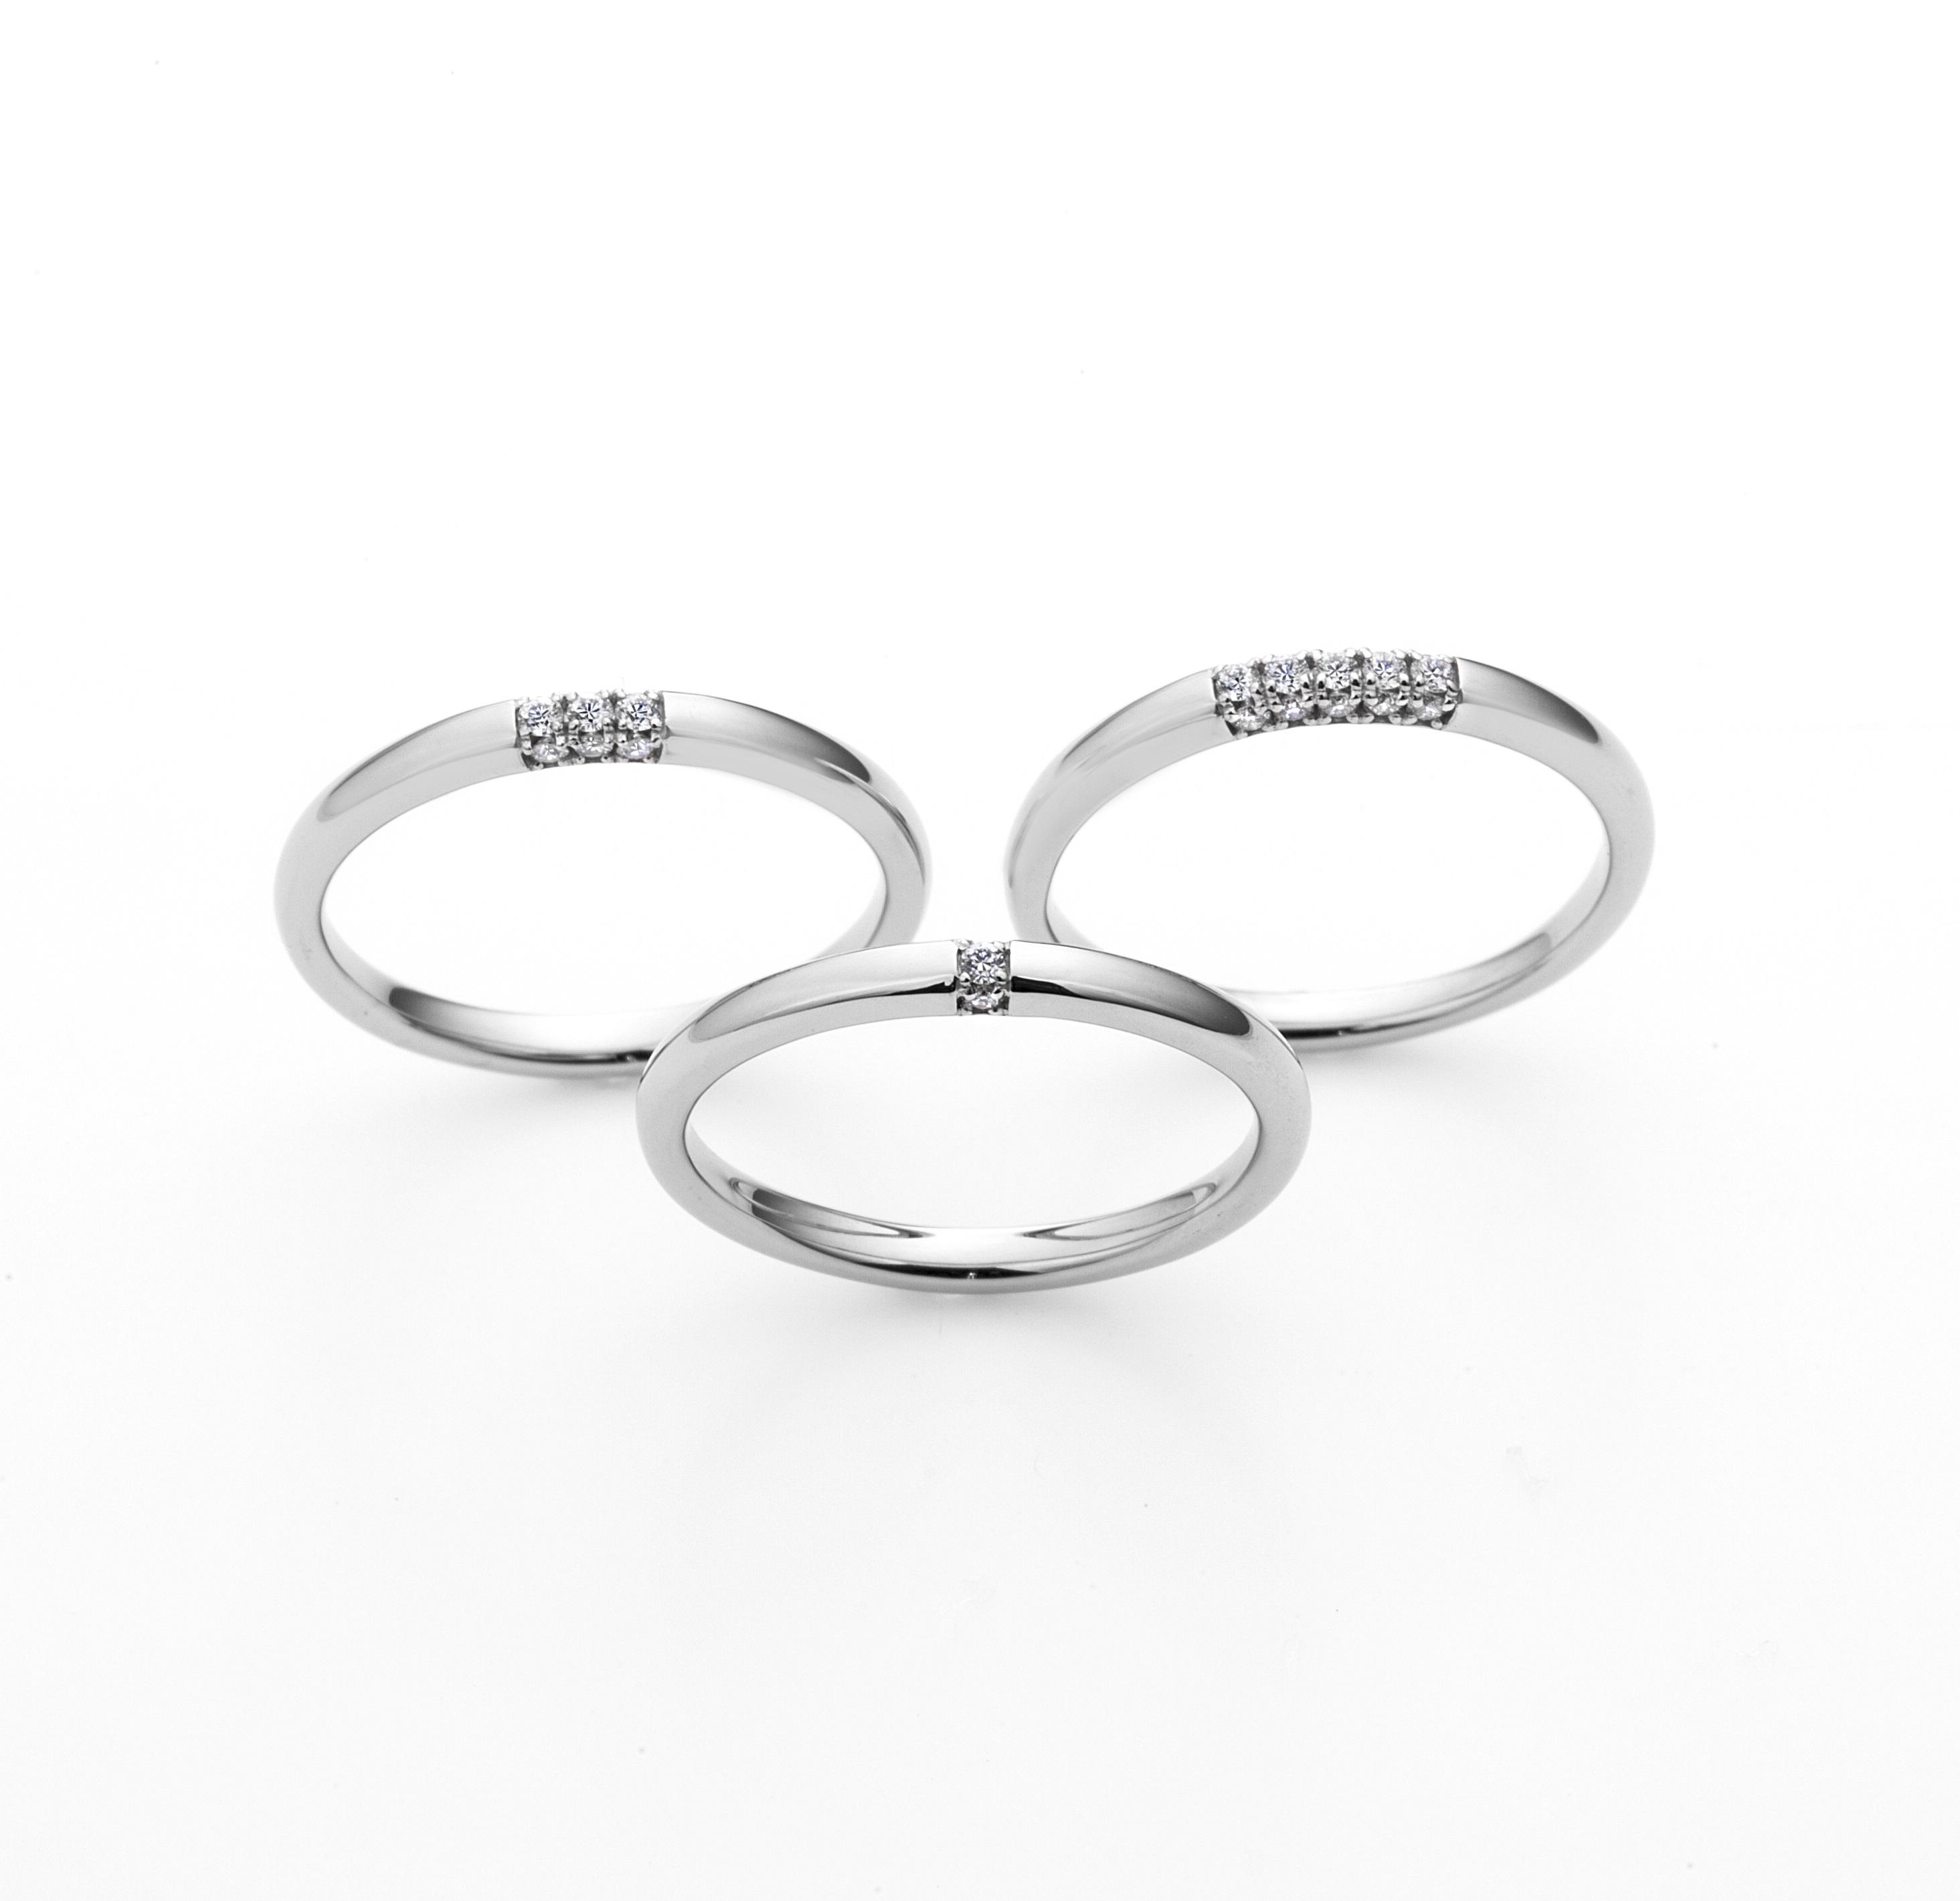 FH002PR・FH004PR/FH001PR|ラザールダイヤモンド 結婚指輪